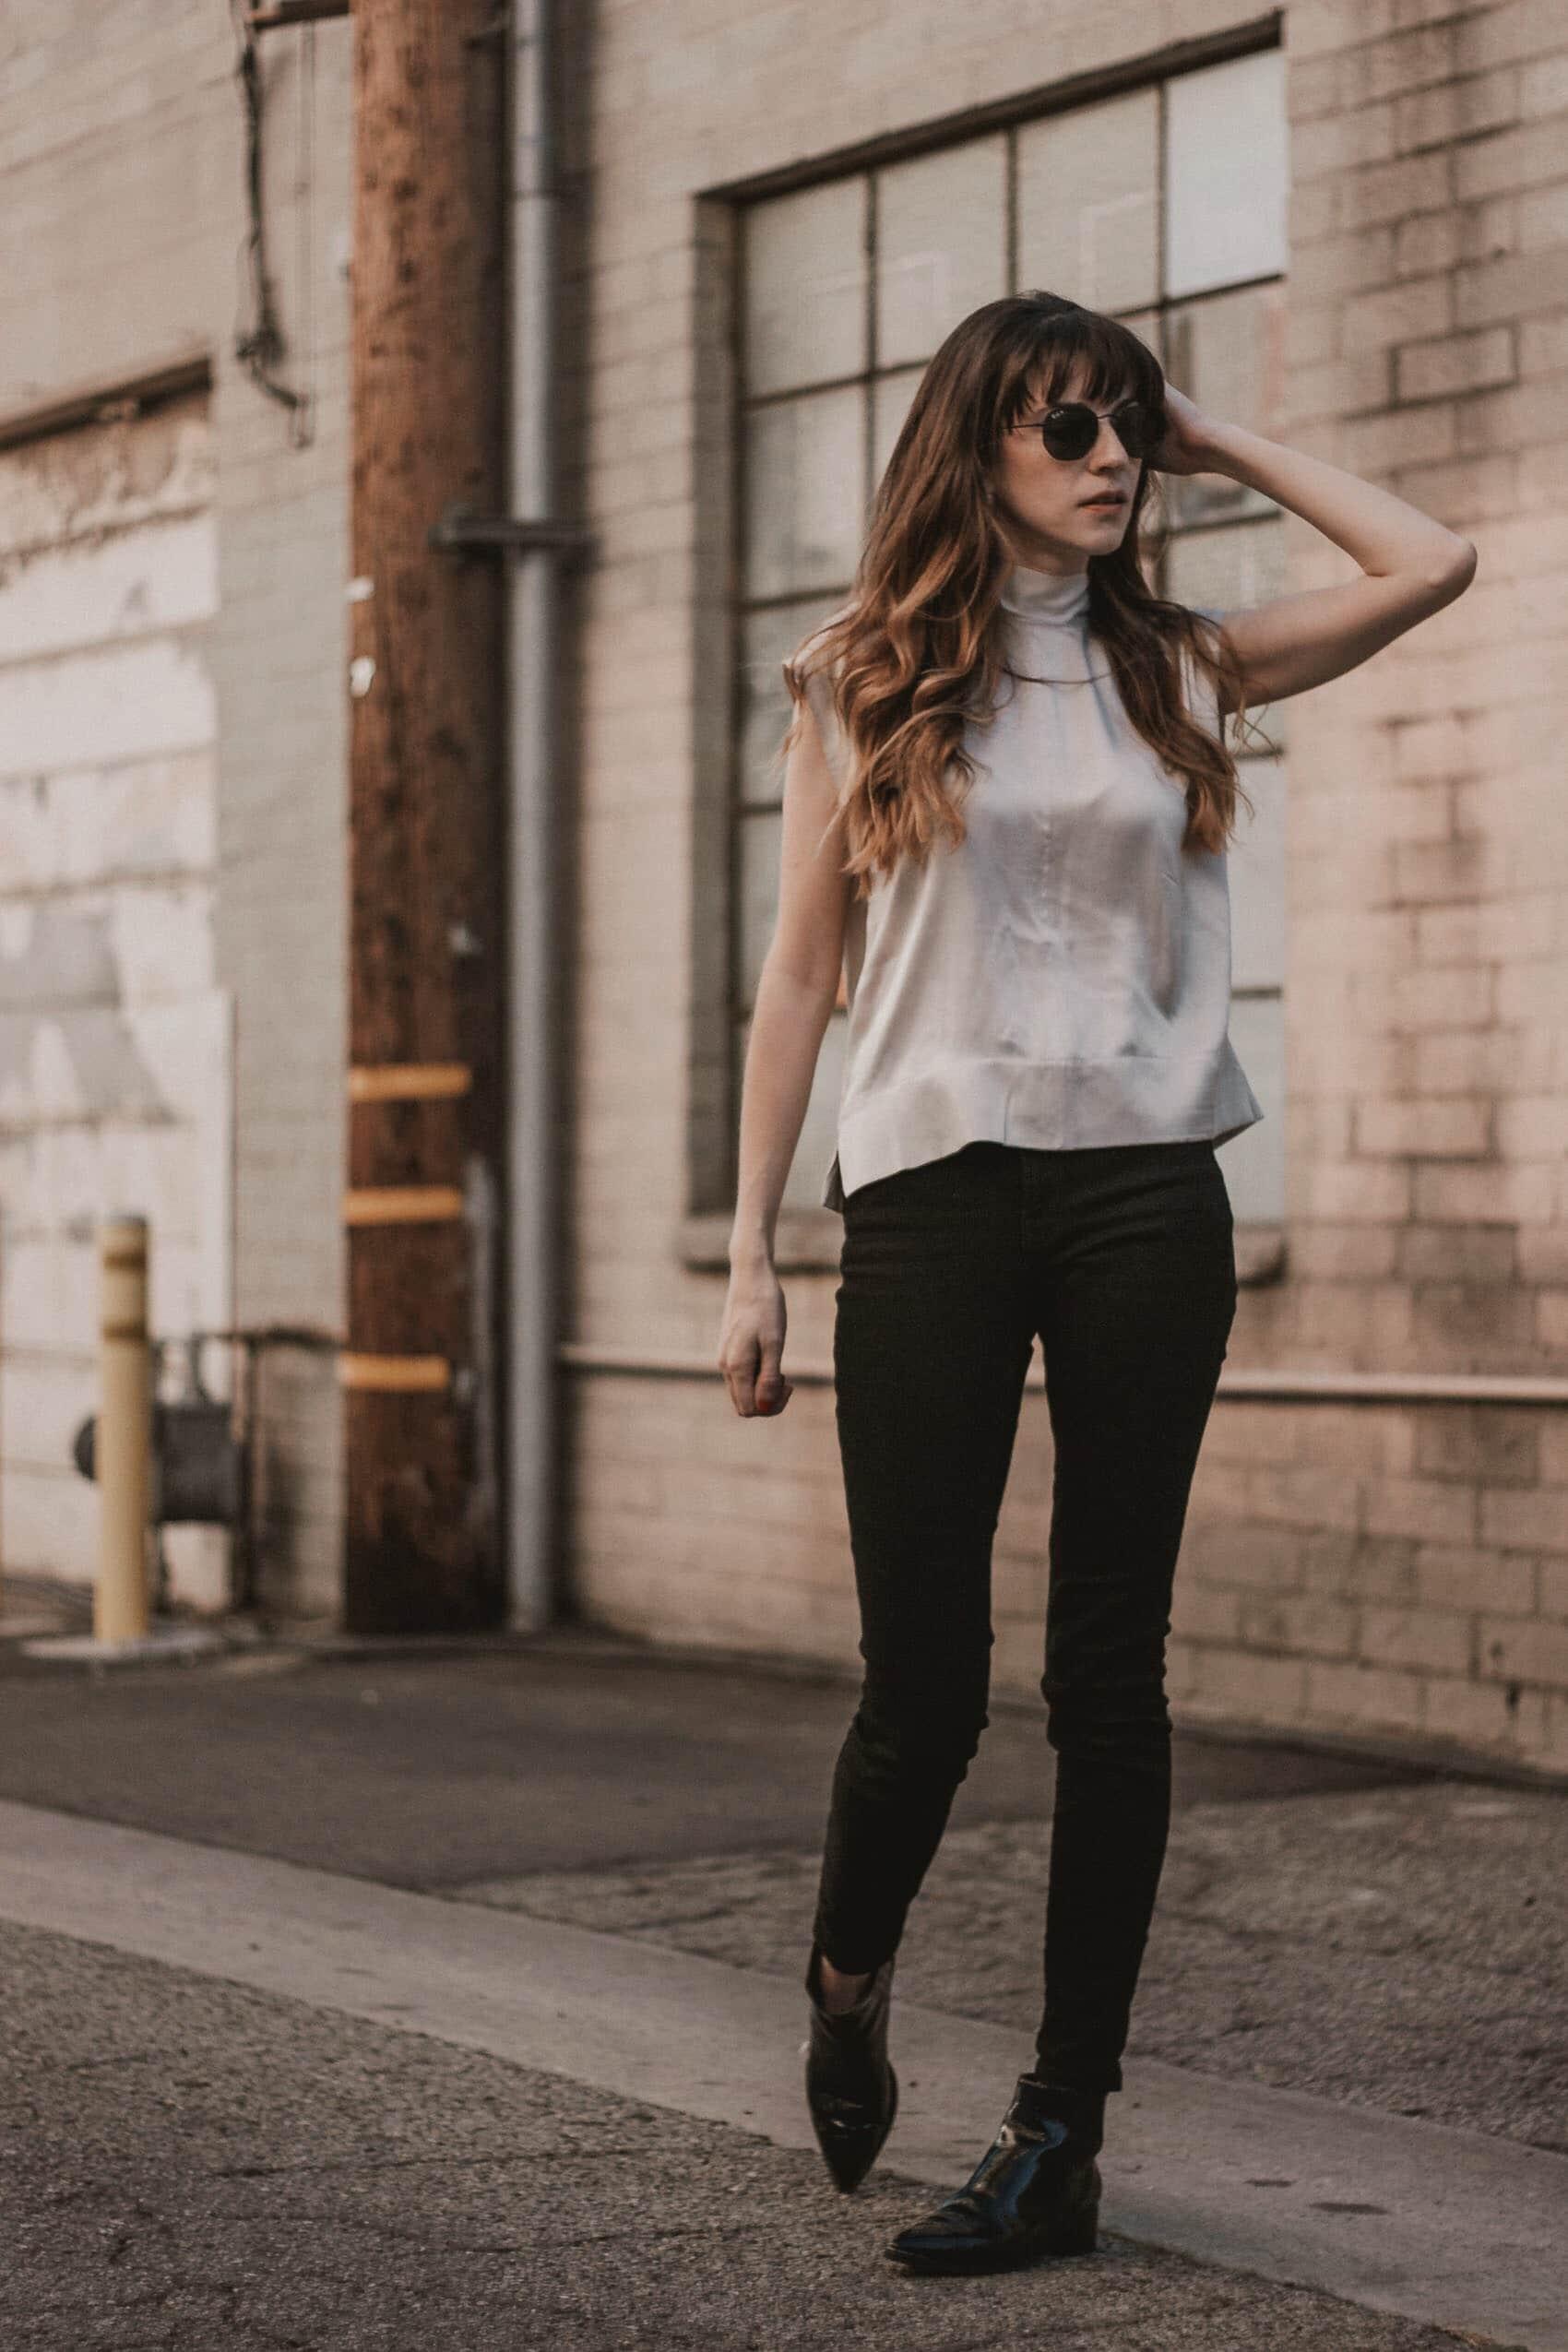 Los Angeles Blogger wearing sustainable fashion brand Everlane